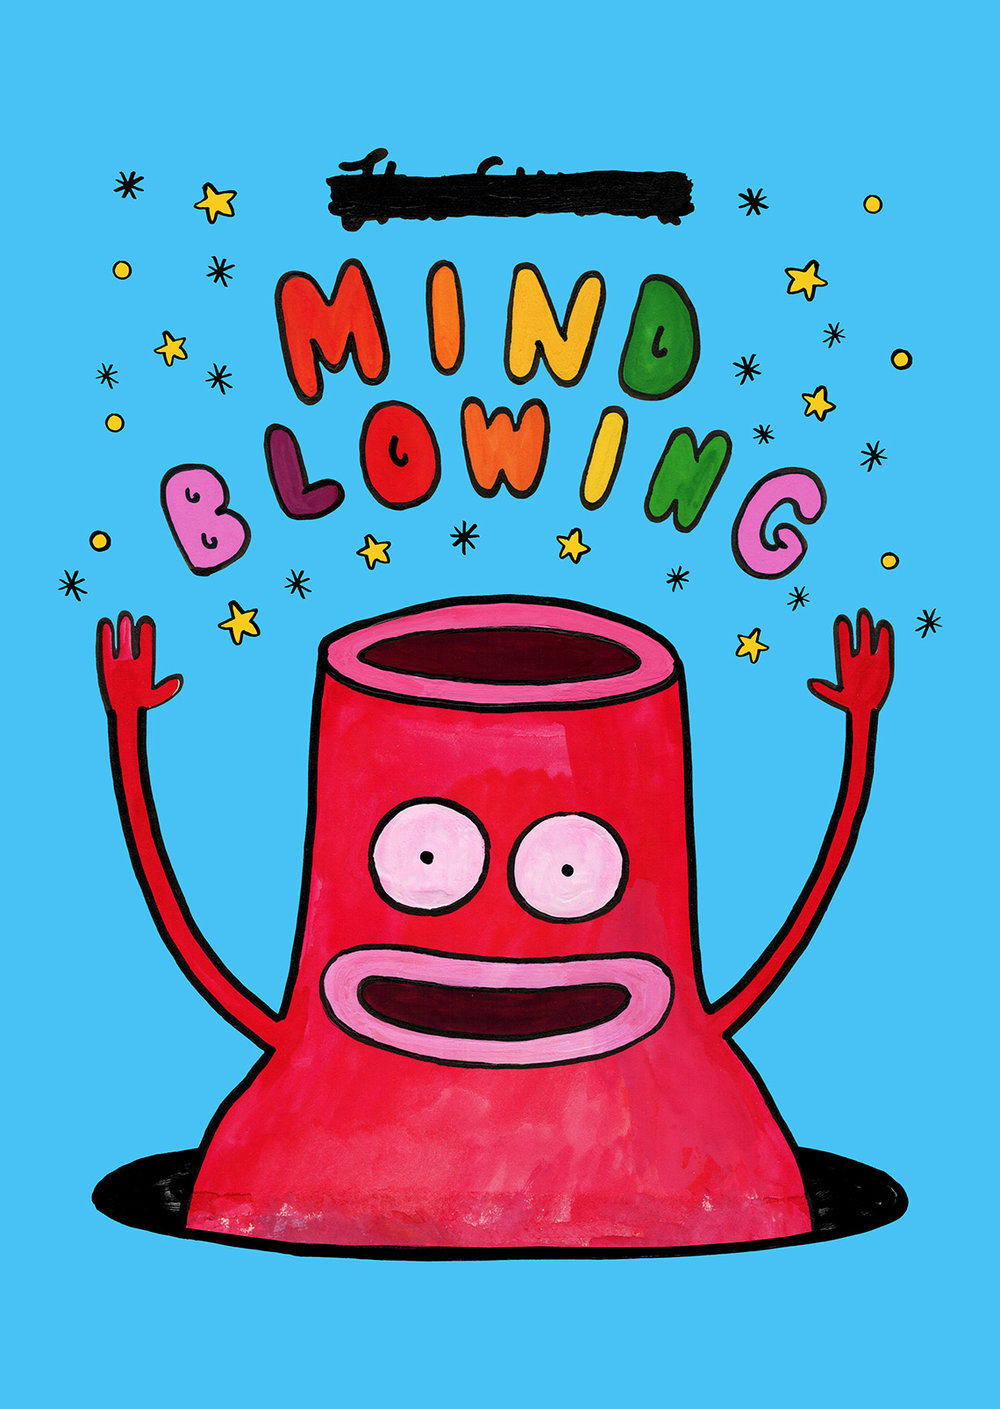 al_murphy_personal_MindBlowing.jpg